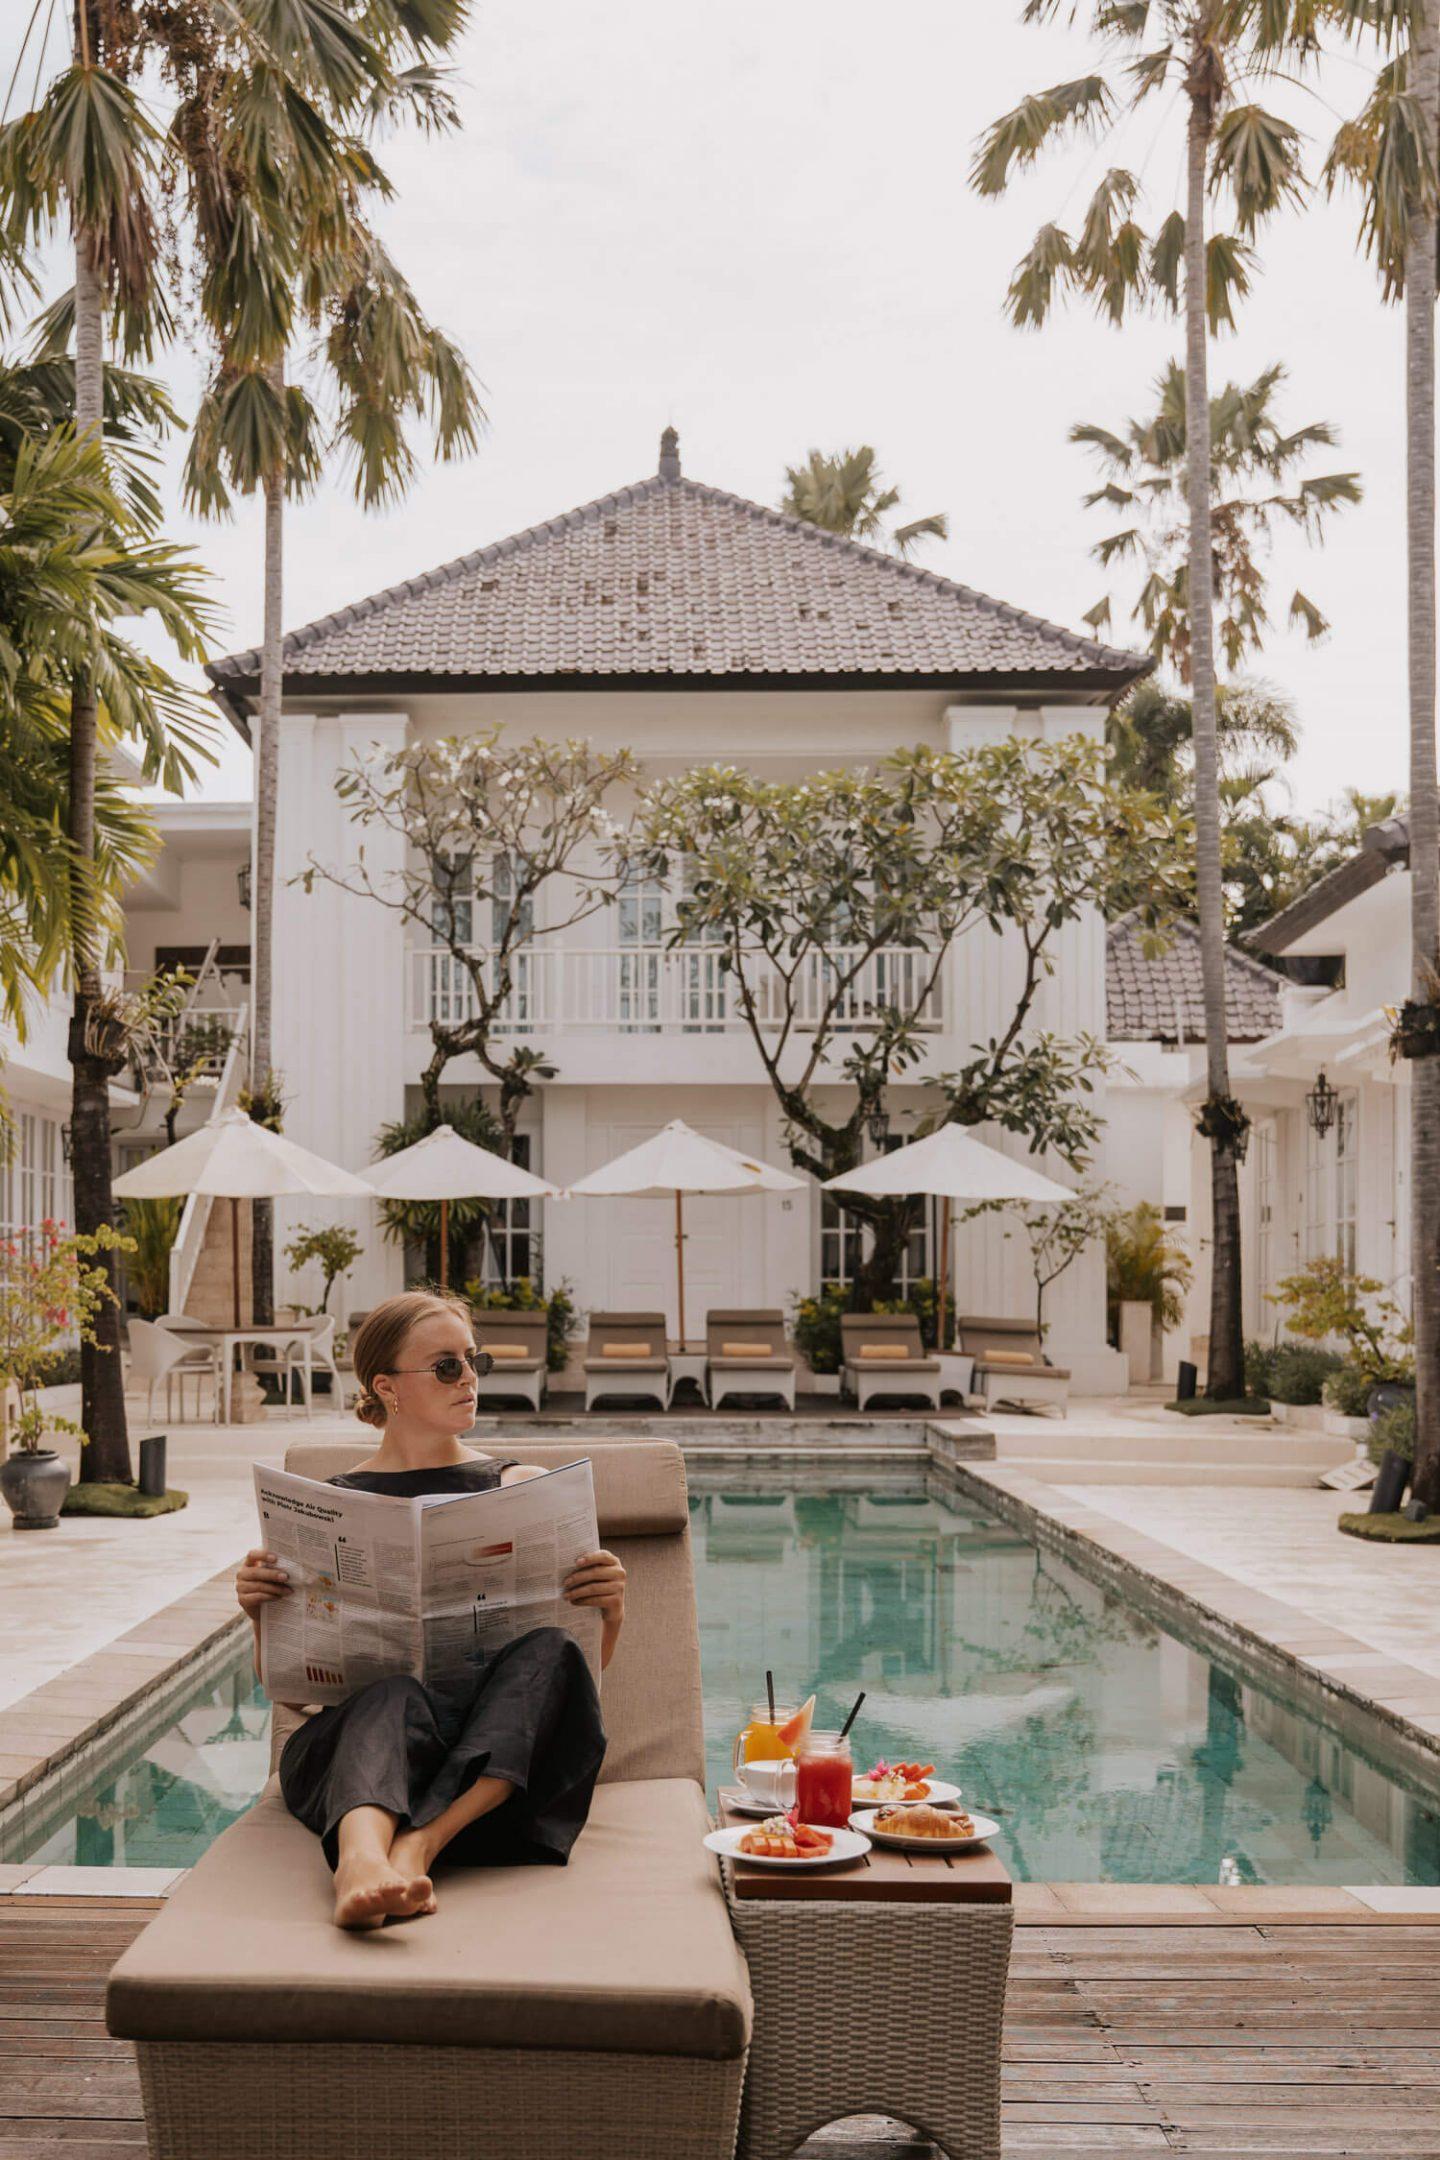 The Colony Hotel Bali Instagram Spots